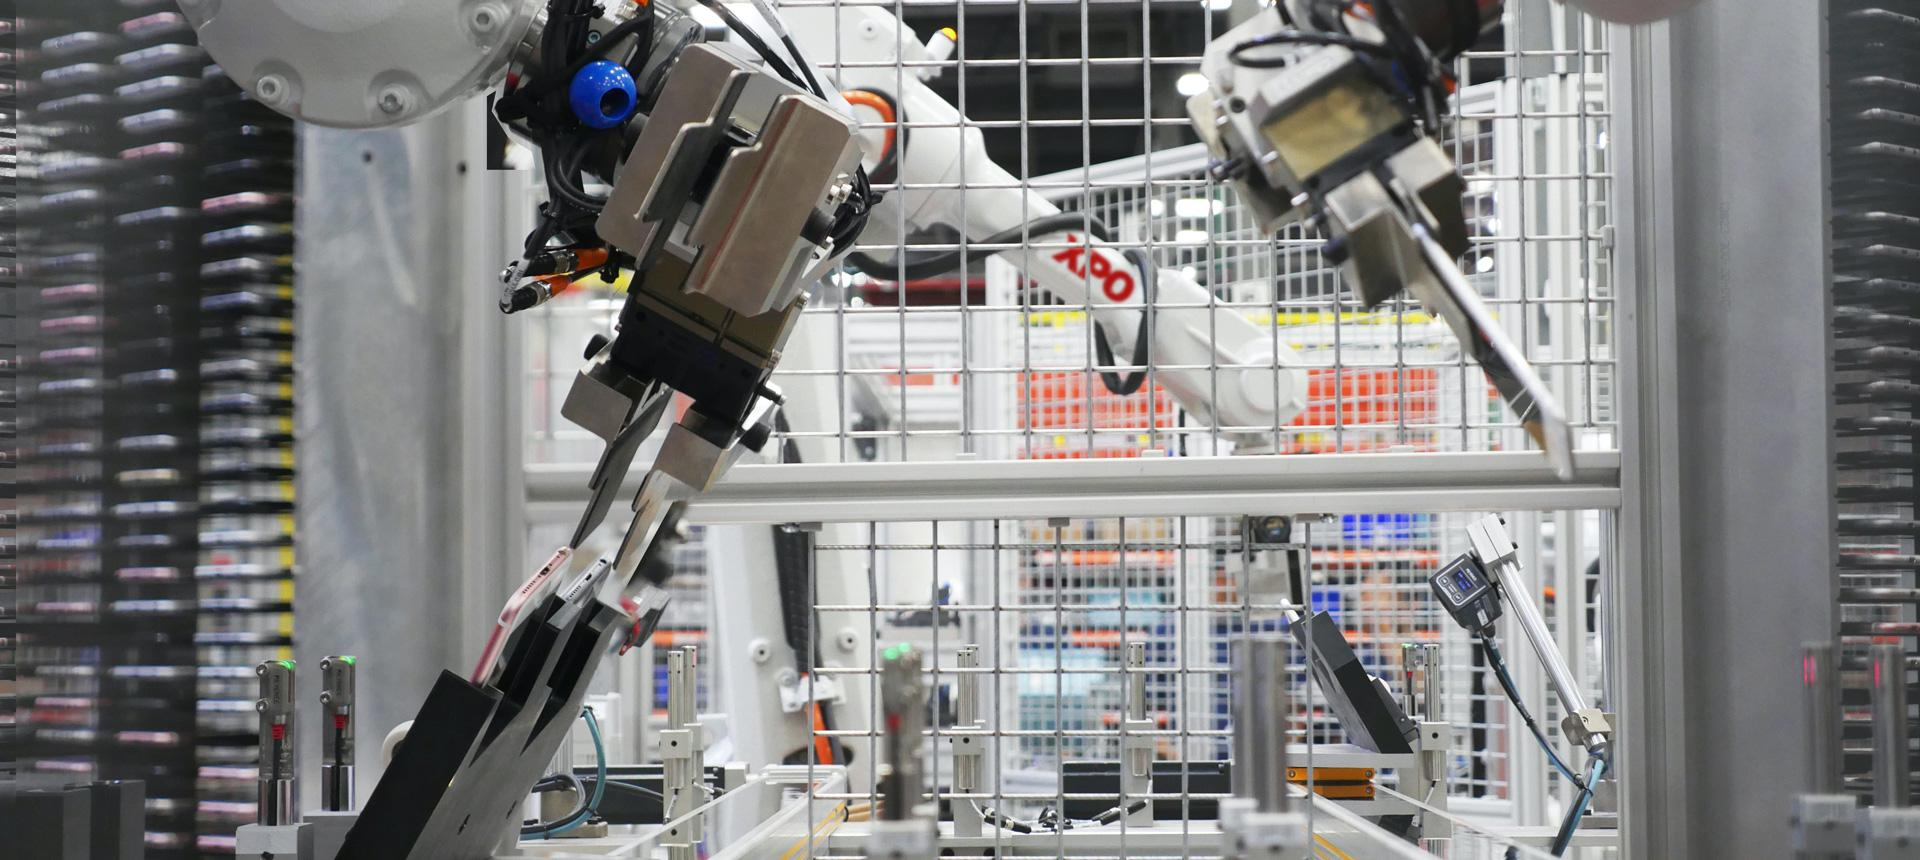 Robotic arm at XPO facility